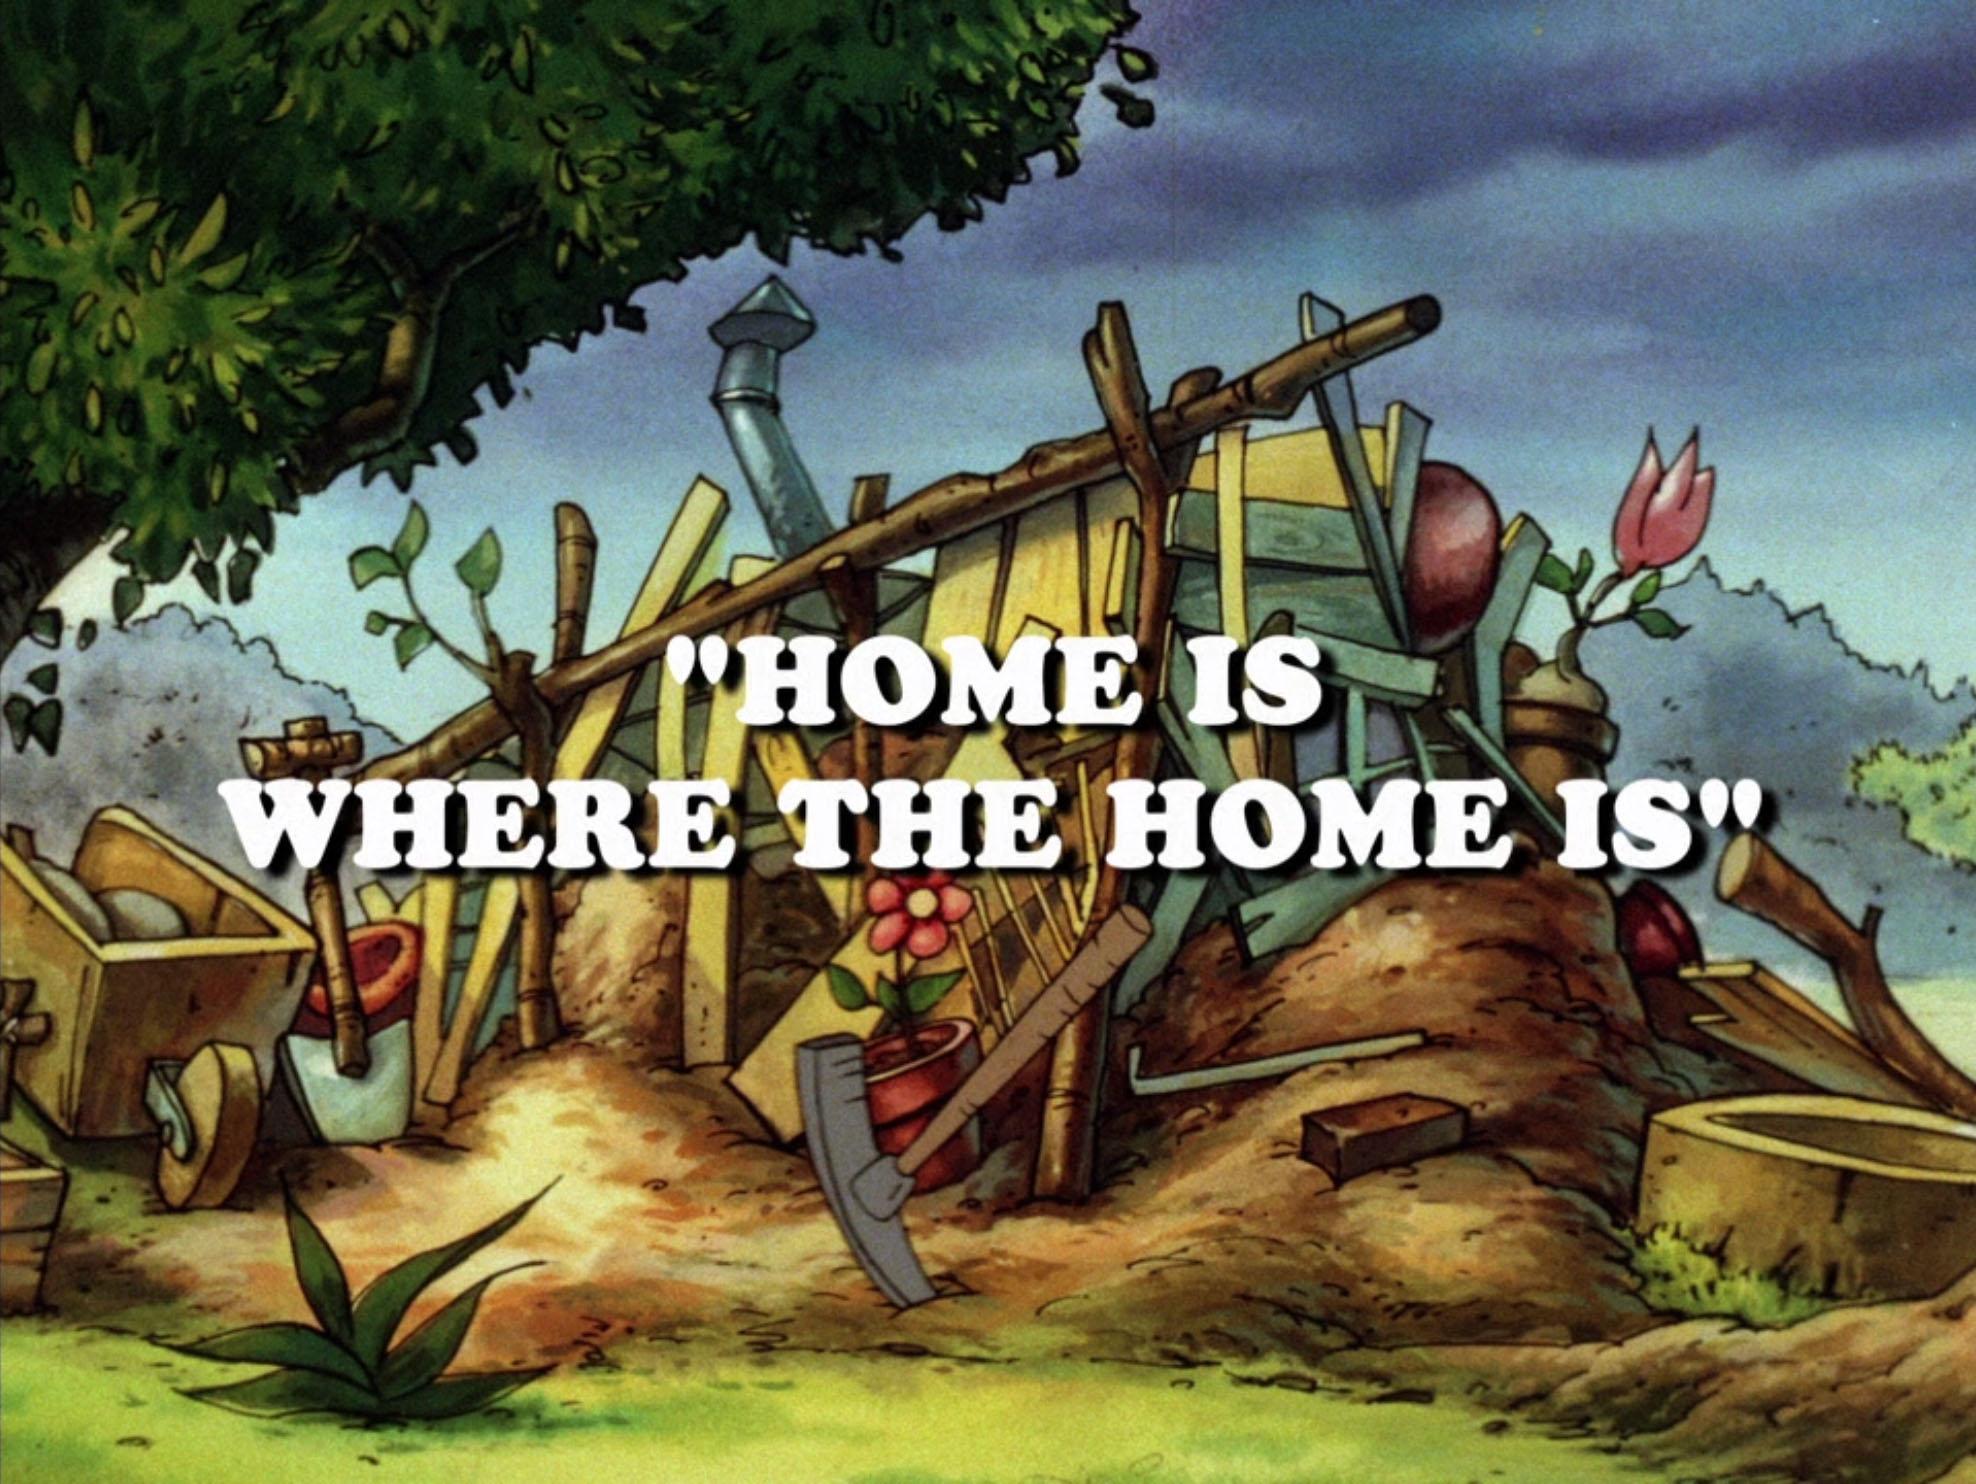 File:Homeiswherethehomeis.jpg